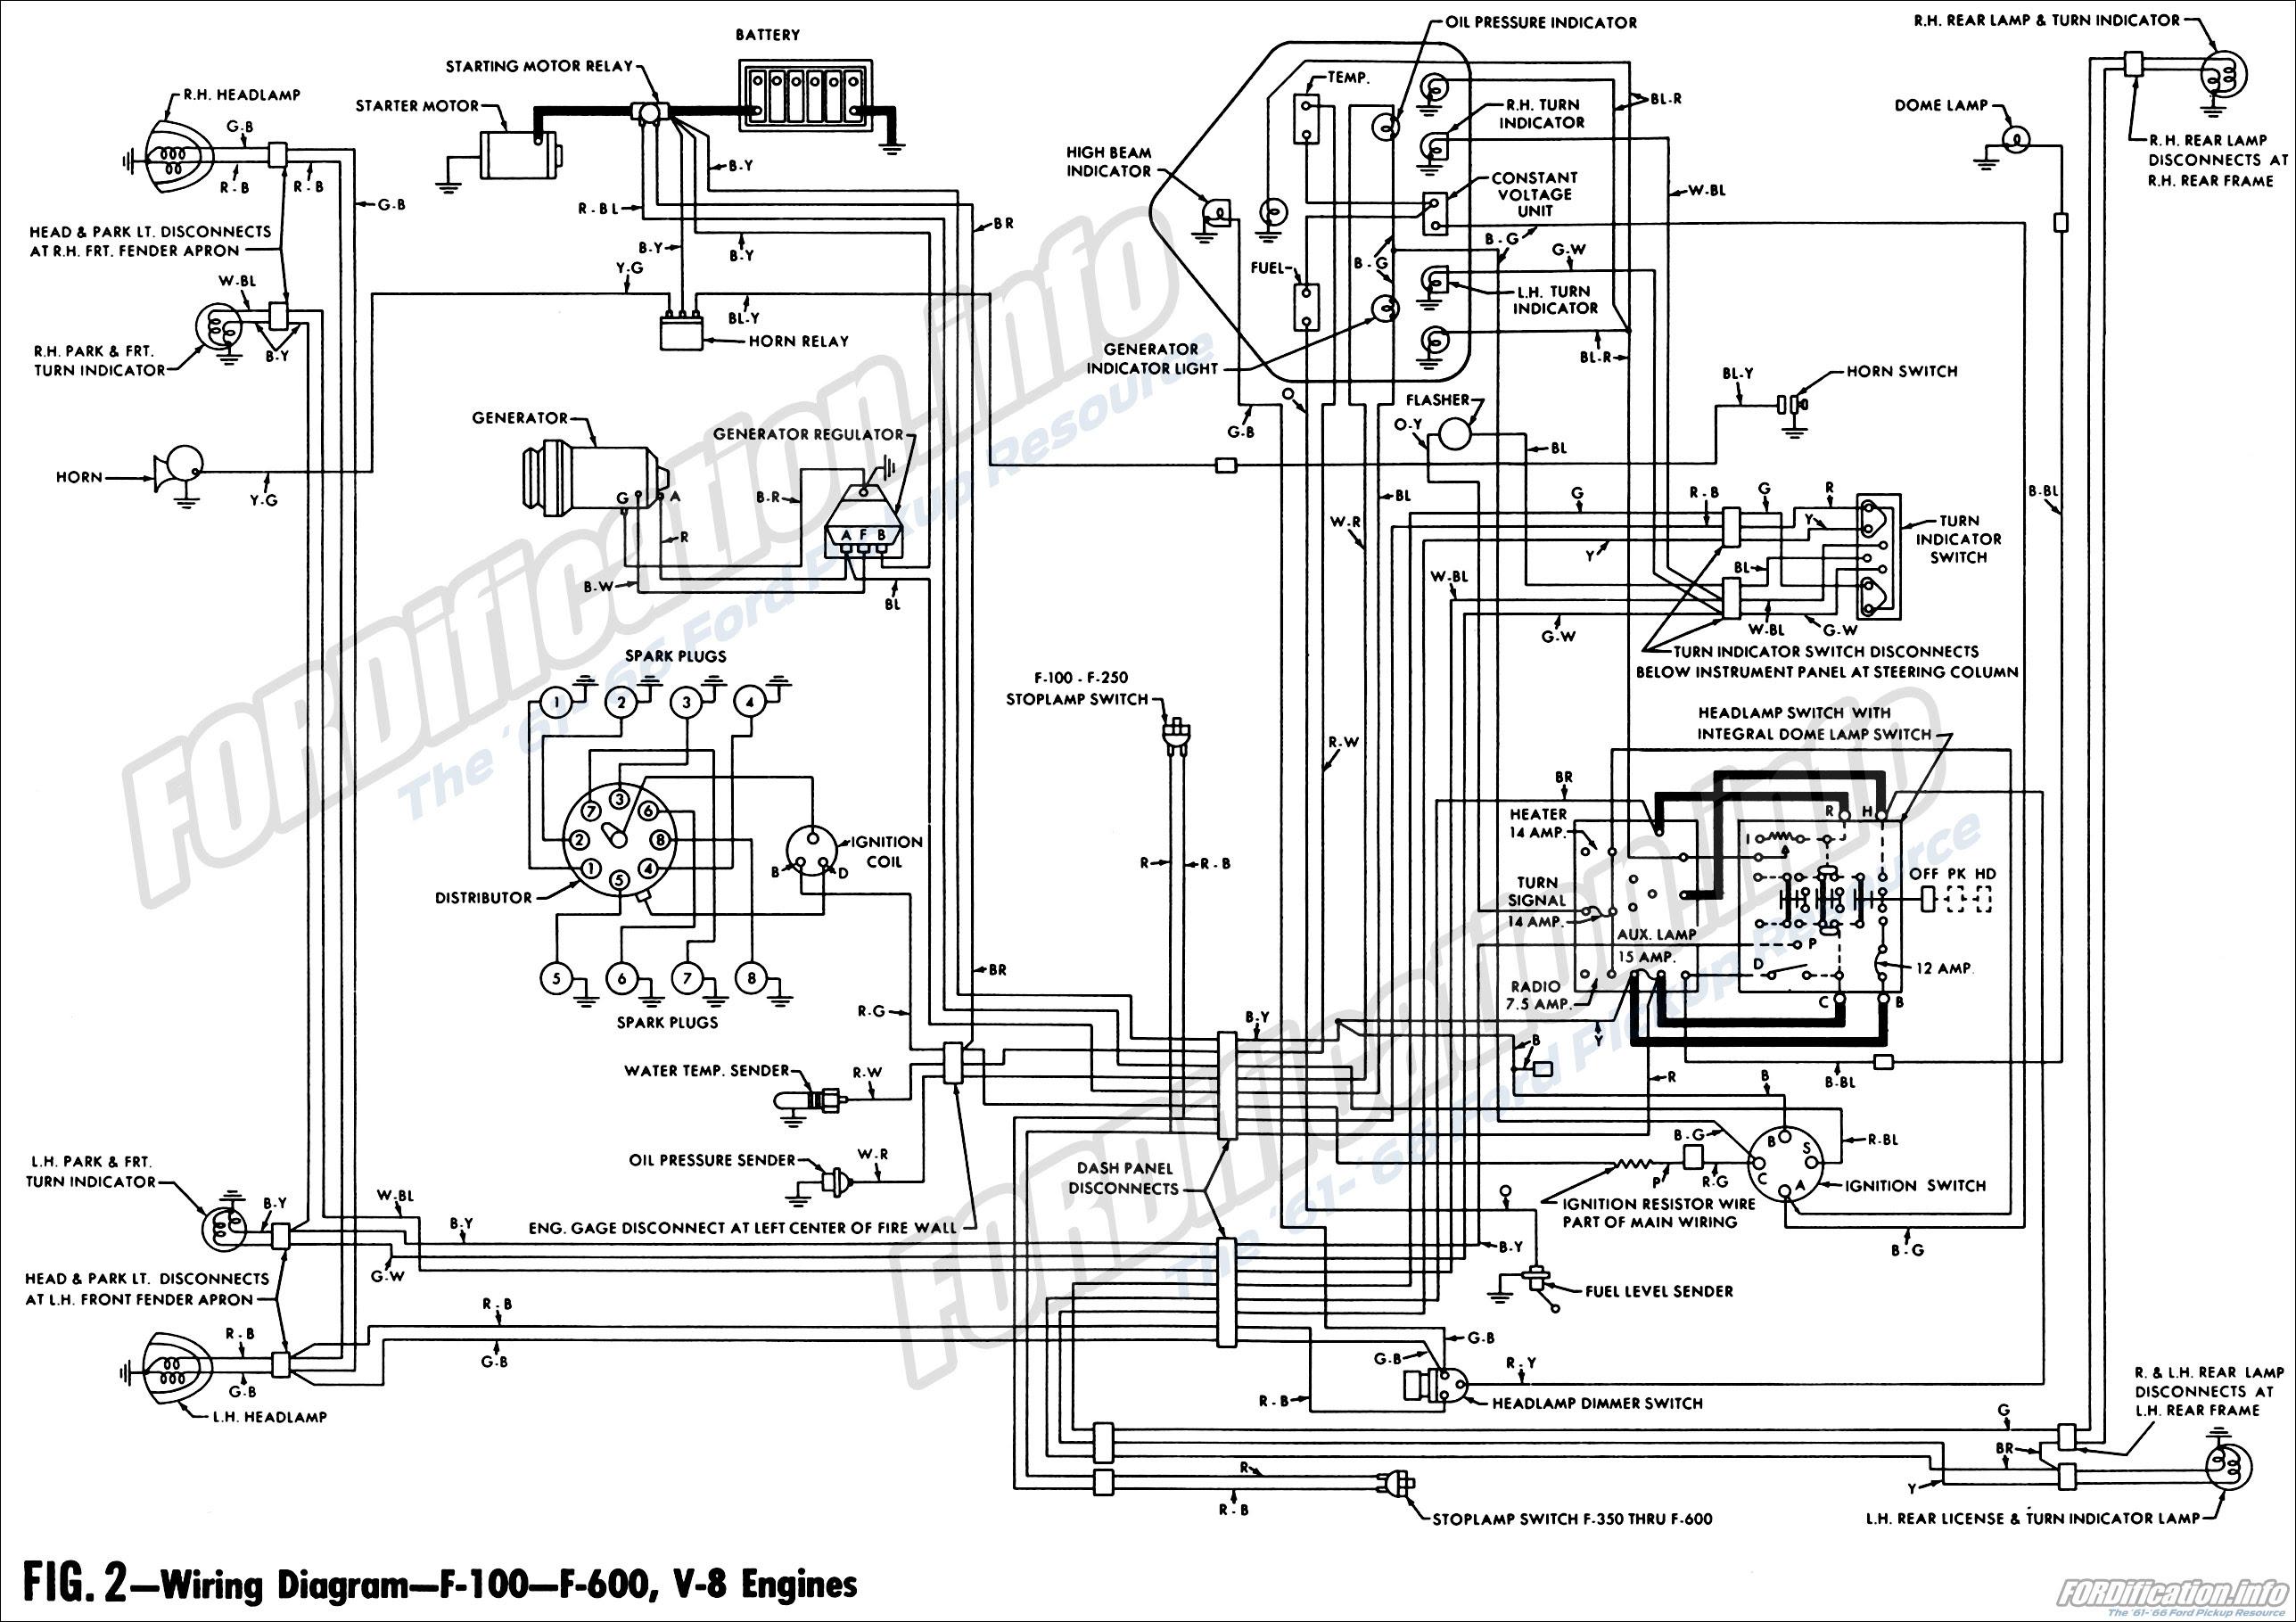 [DIAGRAM] Kenwood Kdc 119 Wiring Diagram FULL Version HD